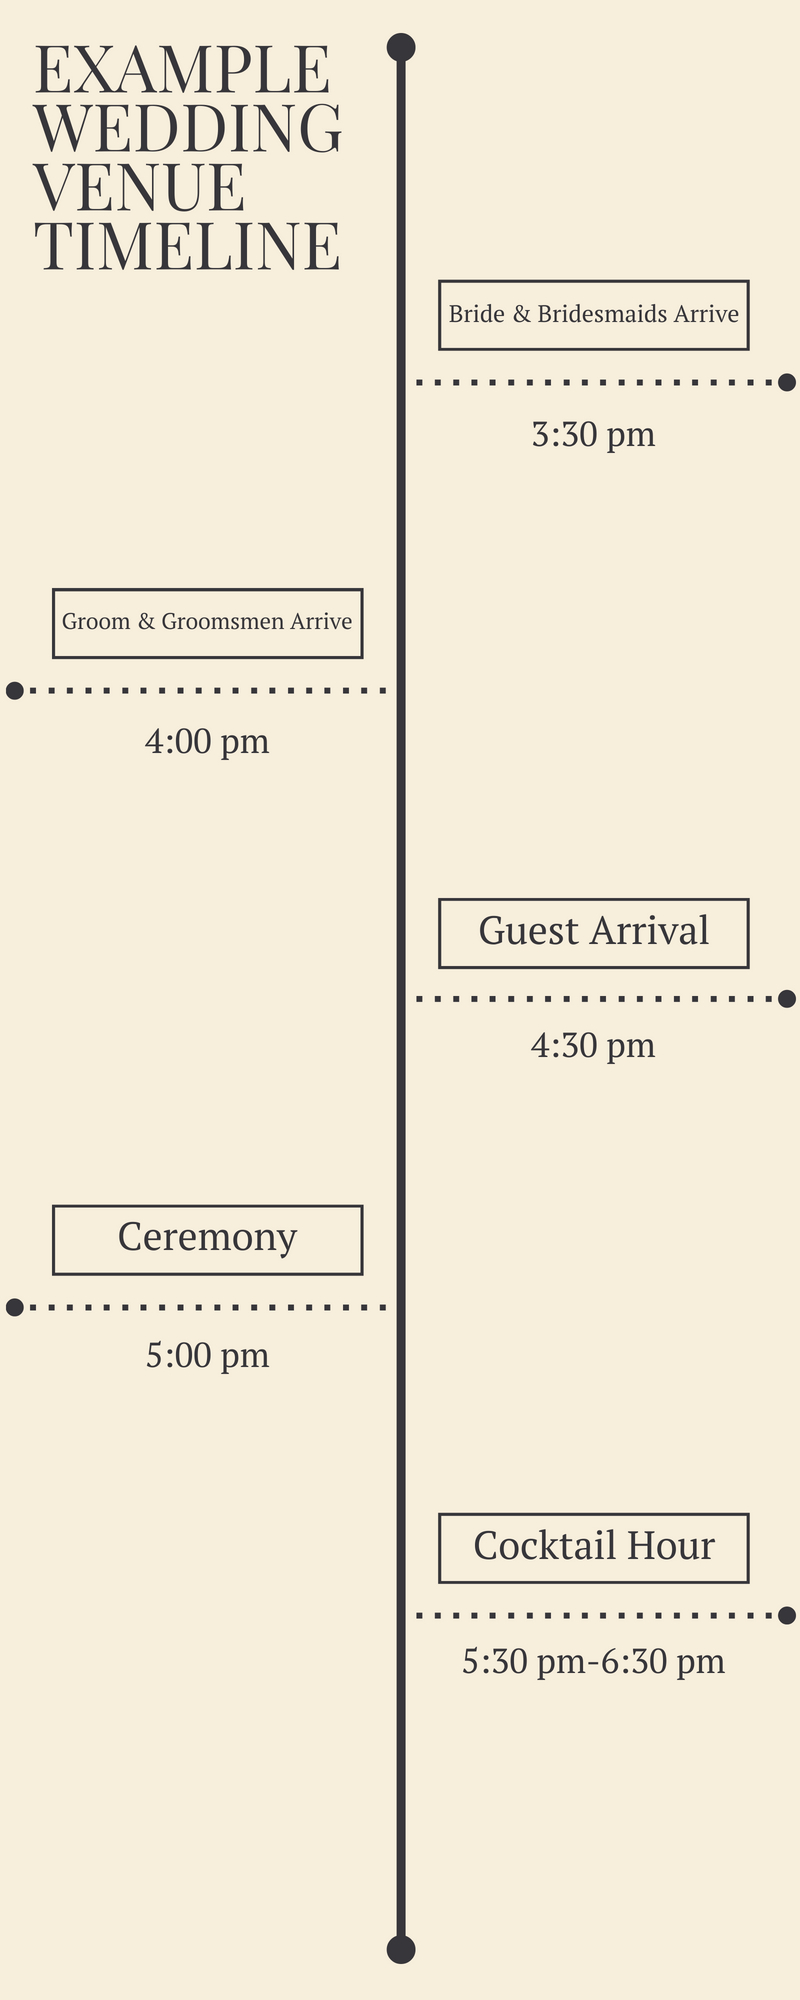 The Wedding Day Timeline.jpg